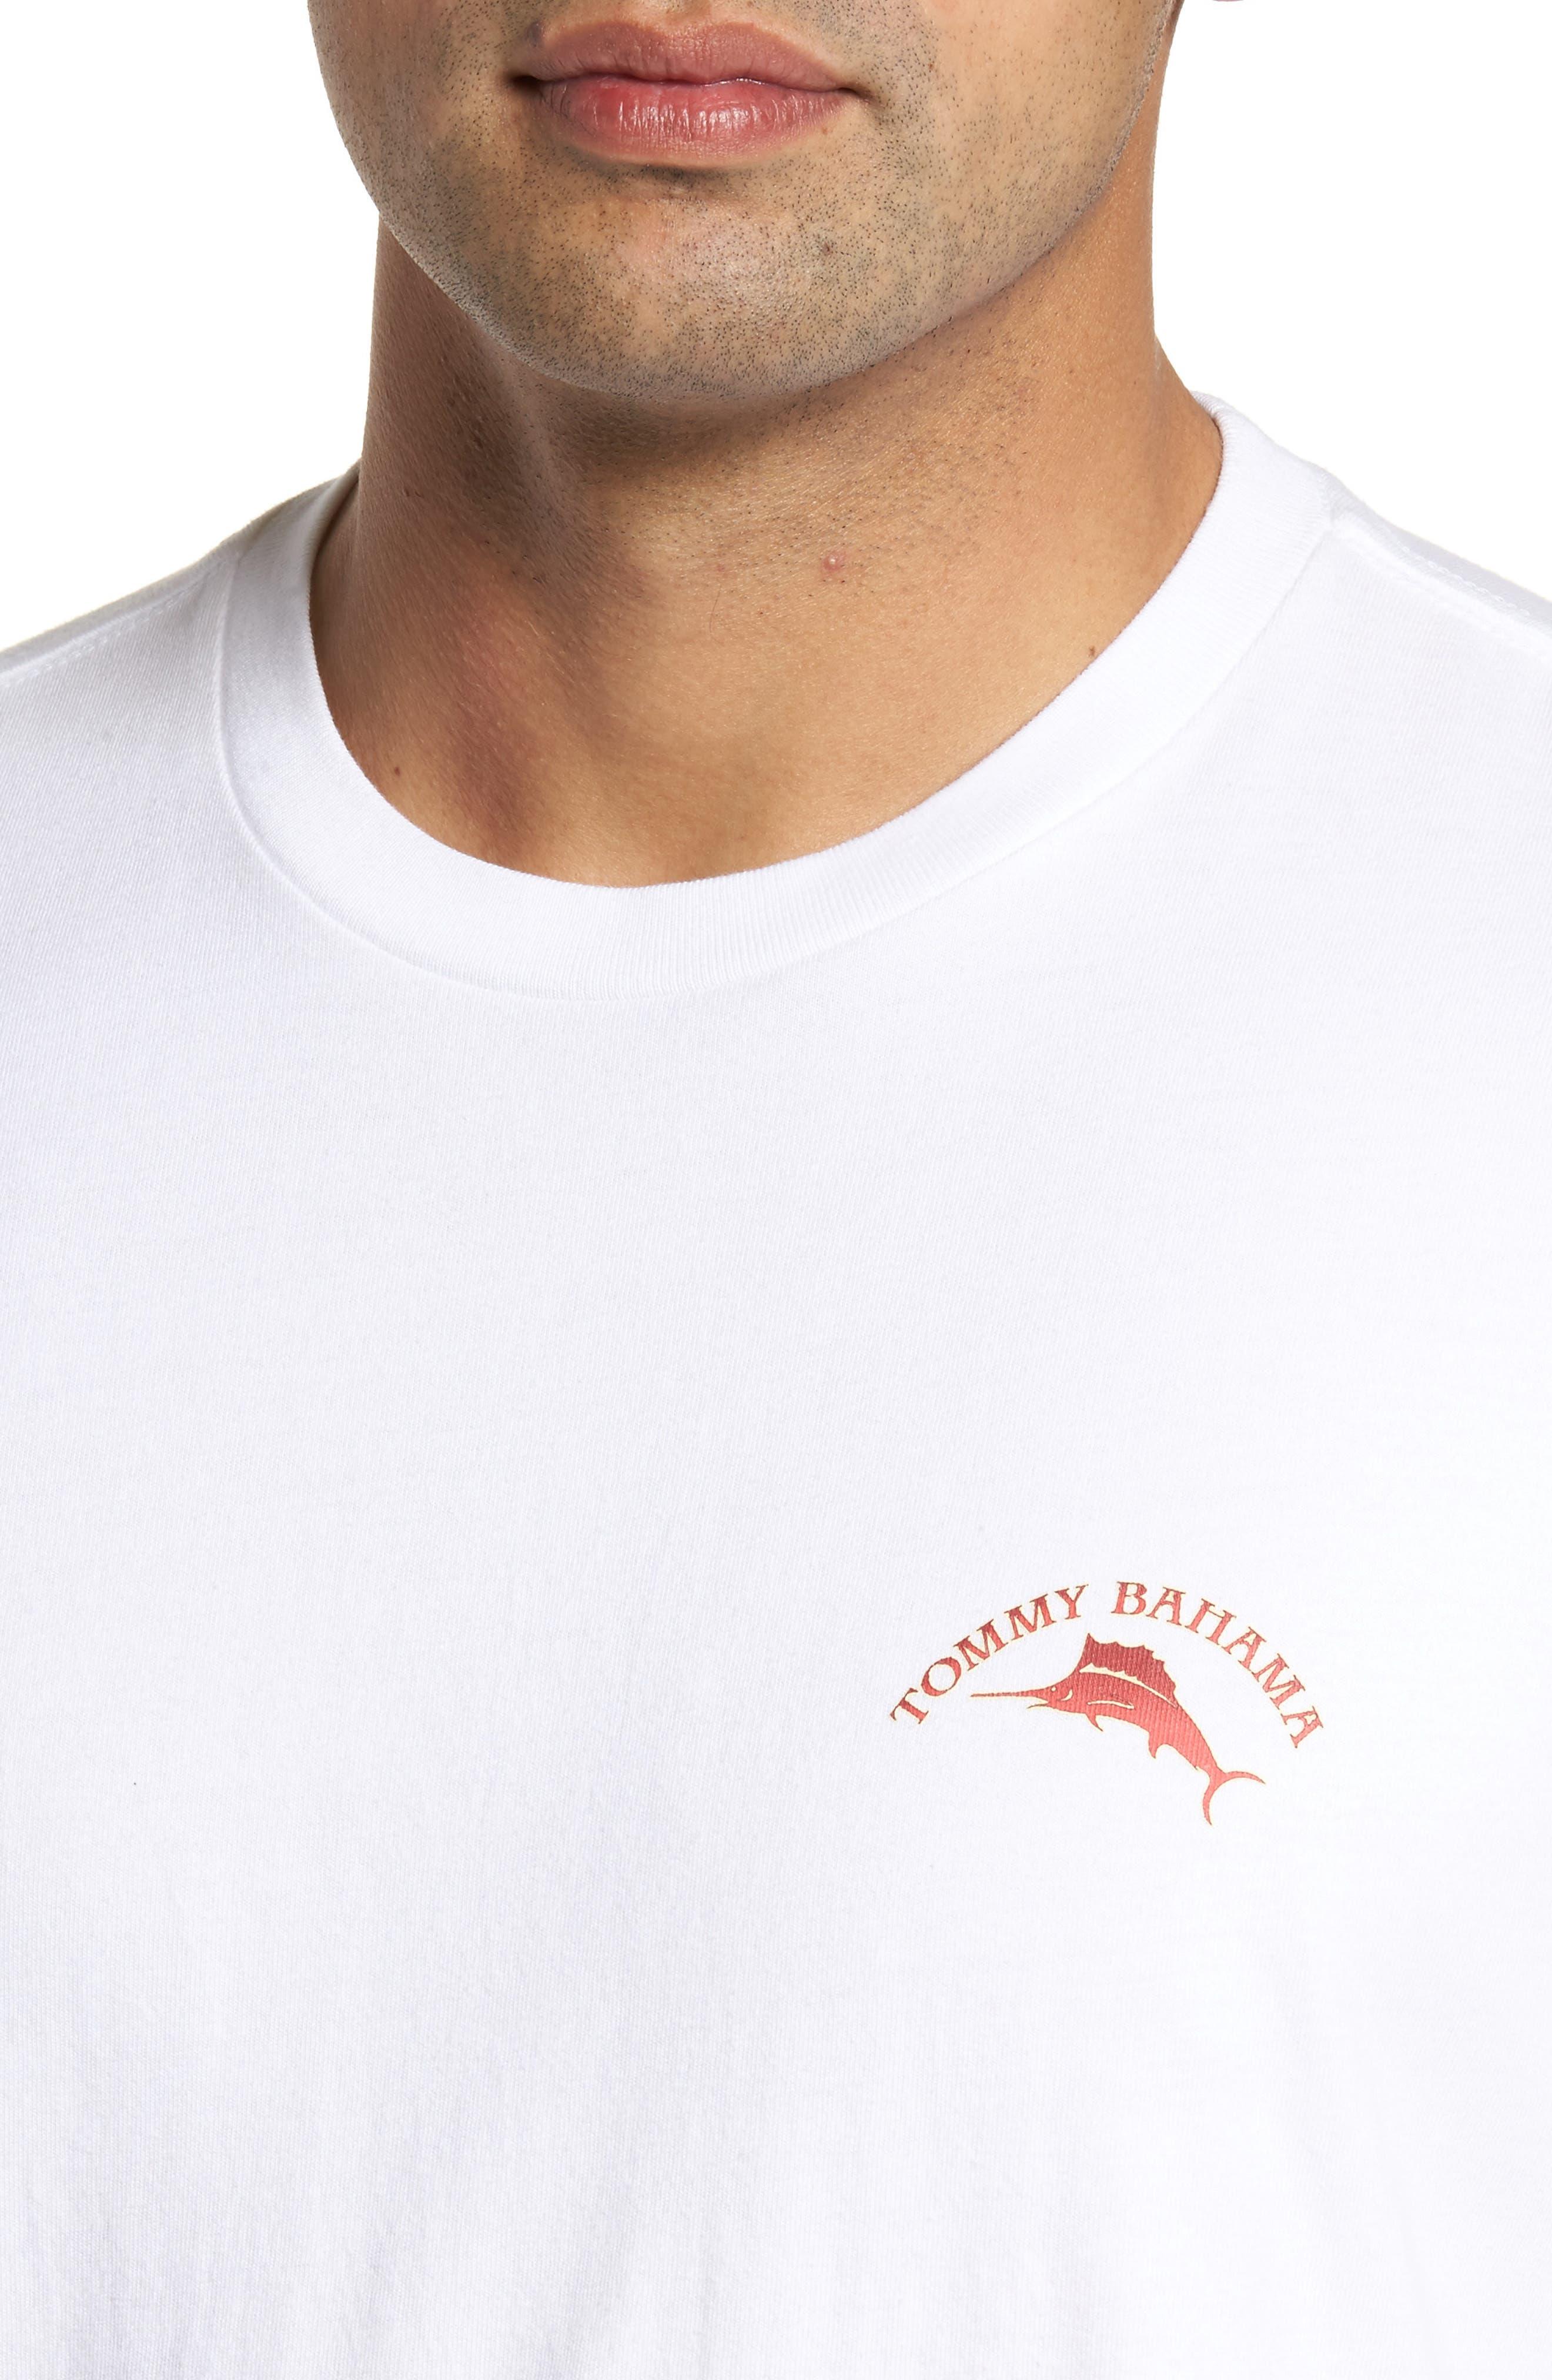 Zinspiration Graphic T-Shirt,                             Alternate thumbnail 4, color,                             White